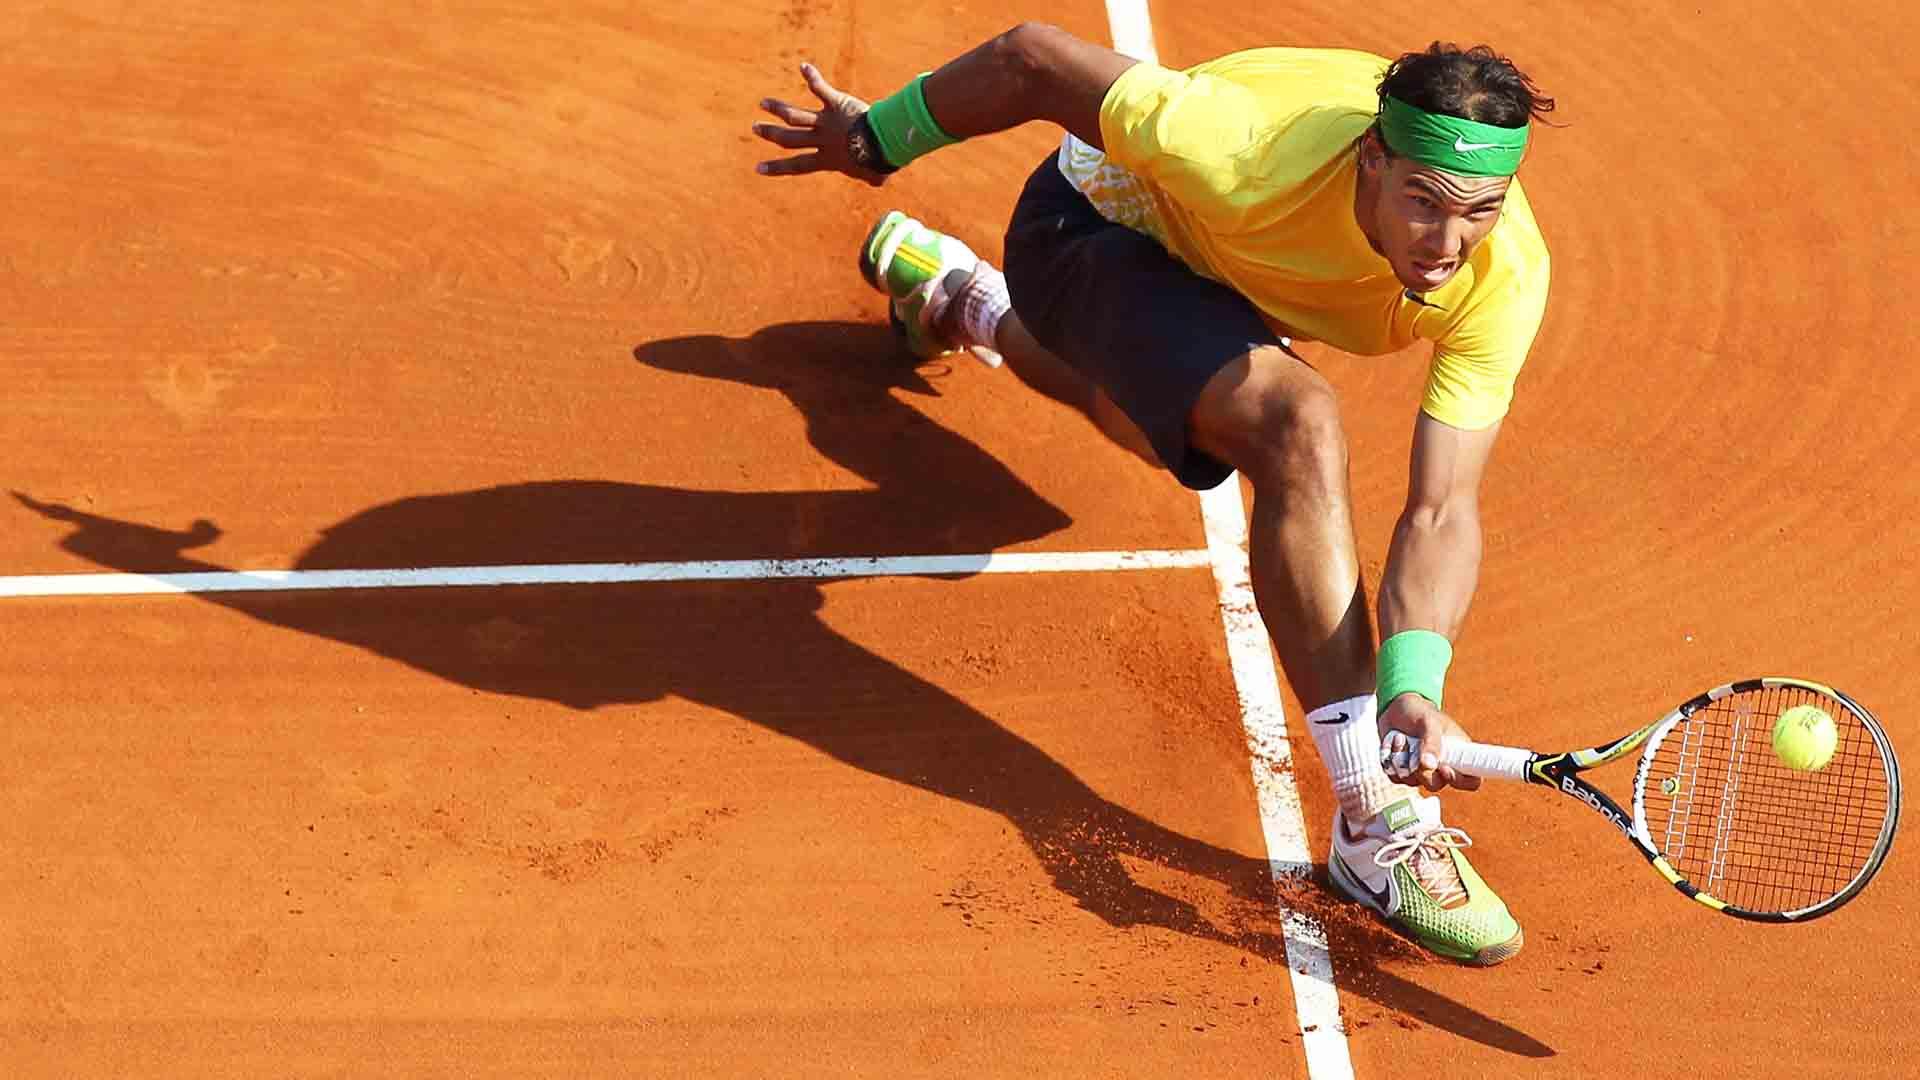 Rafael Nadal beats David Ferrer to win his seventh straight Rolex Monte-Carlo Masters title.